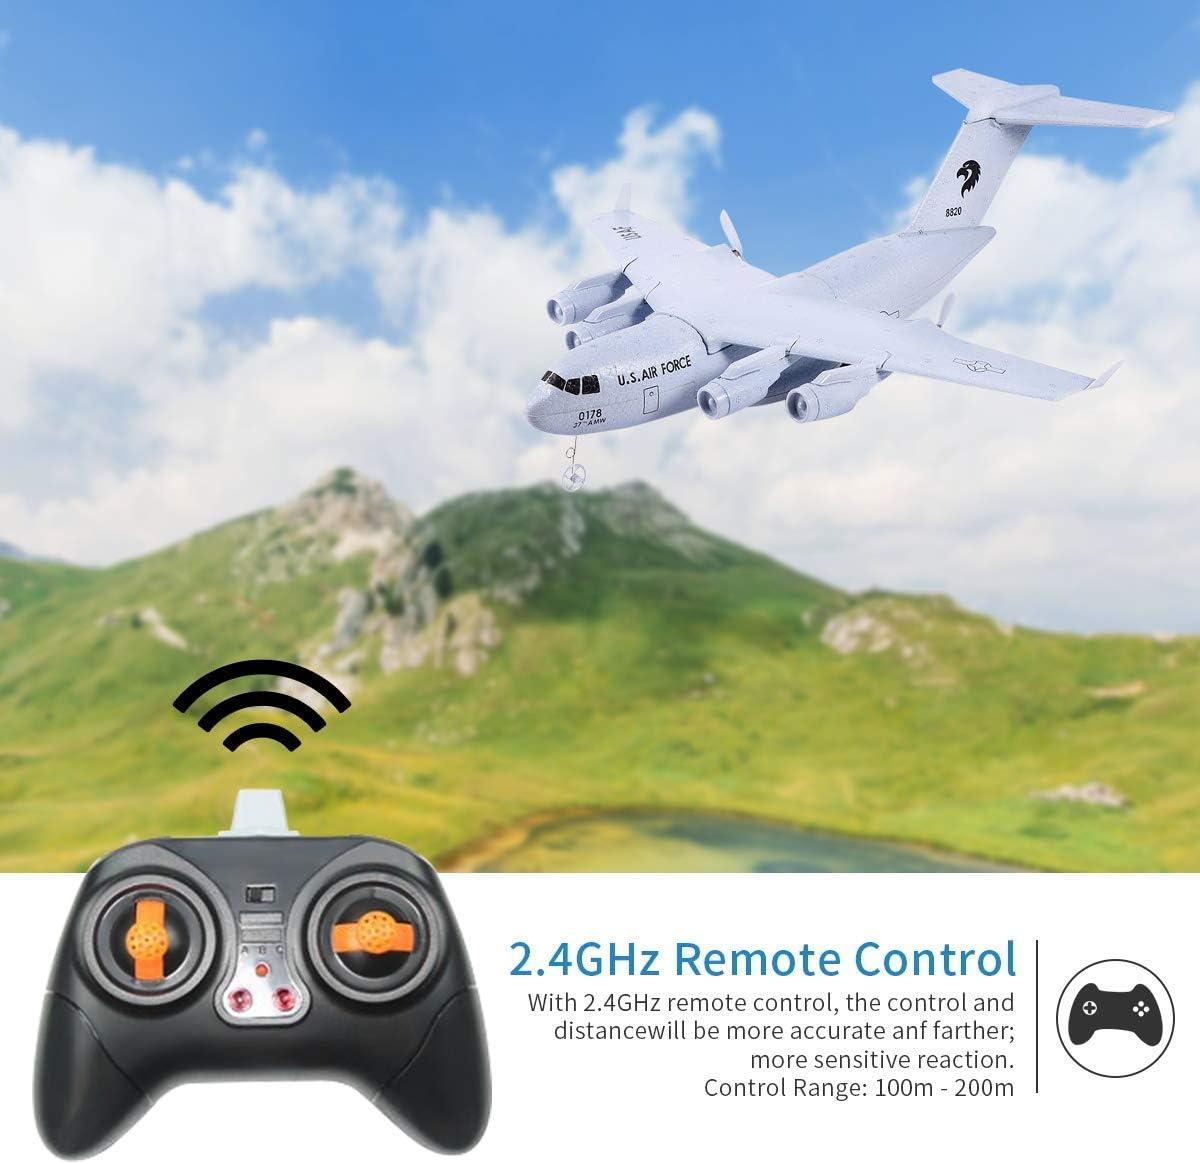 Makerfire RC Aereo C-17 Trasporto EPP Aereo Fai da Te 2 canali 2.4 GHz Telecomando 3 Assi giroscopio Giocattolo Aereo RTF